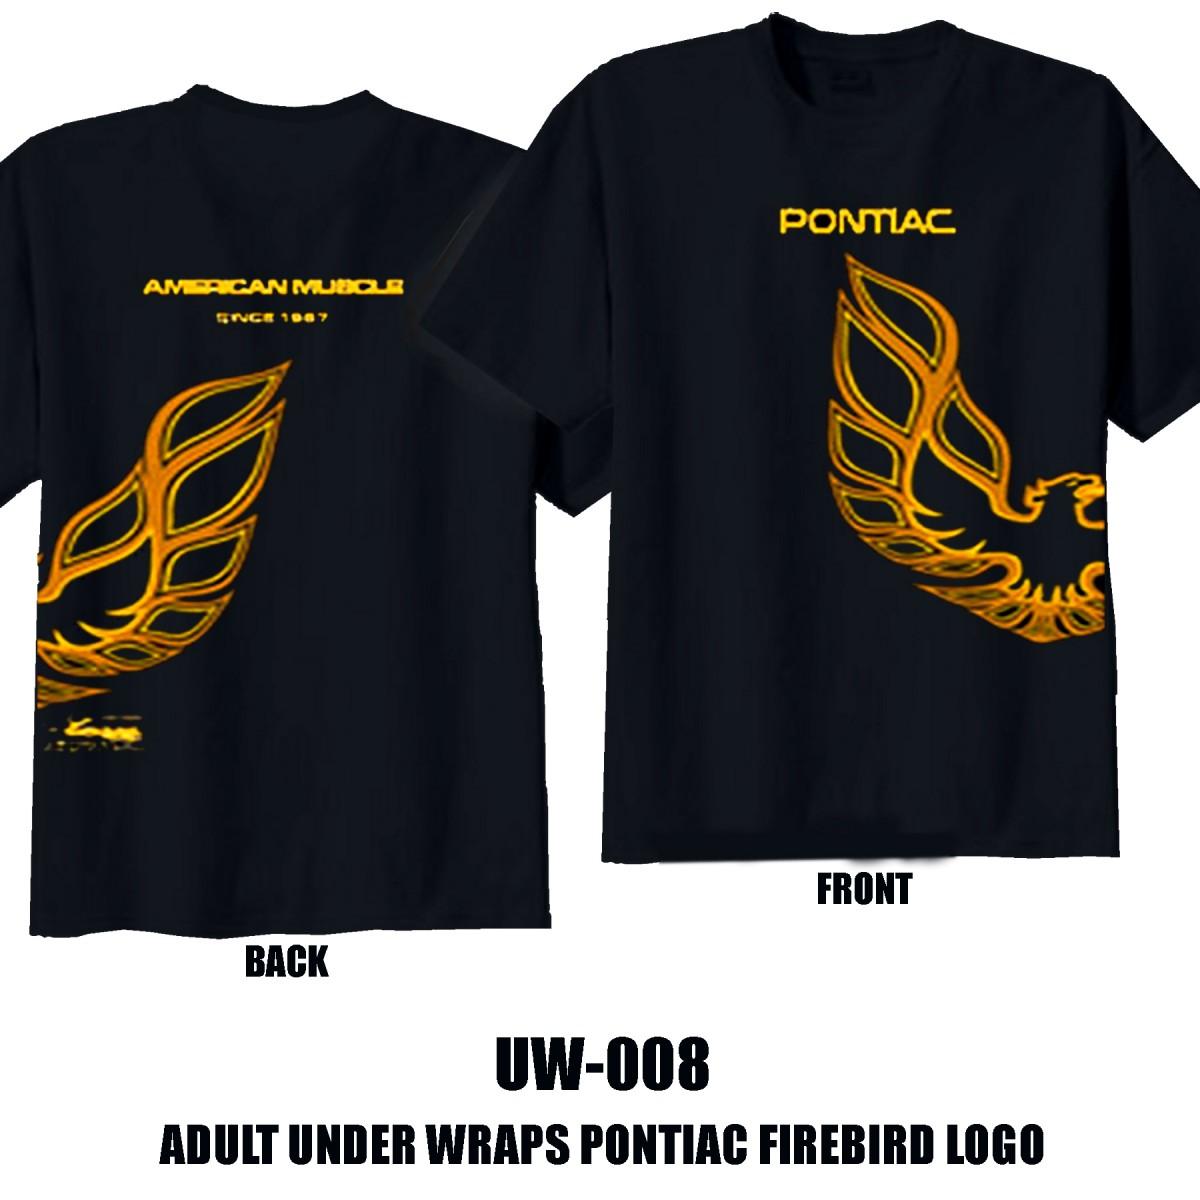 HossRods.com | Pontiac Firebird T Shirt | Hot Rod Accessories, Garage Gear, and More